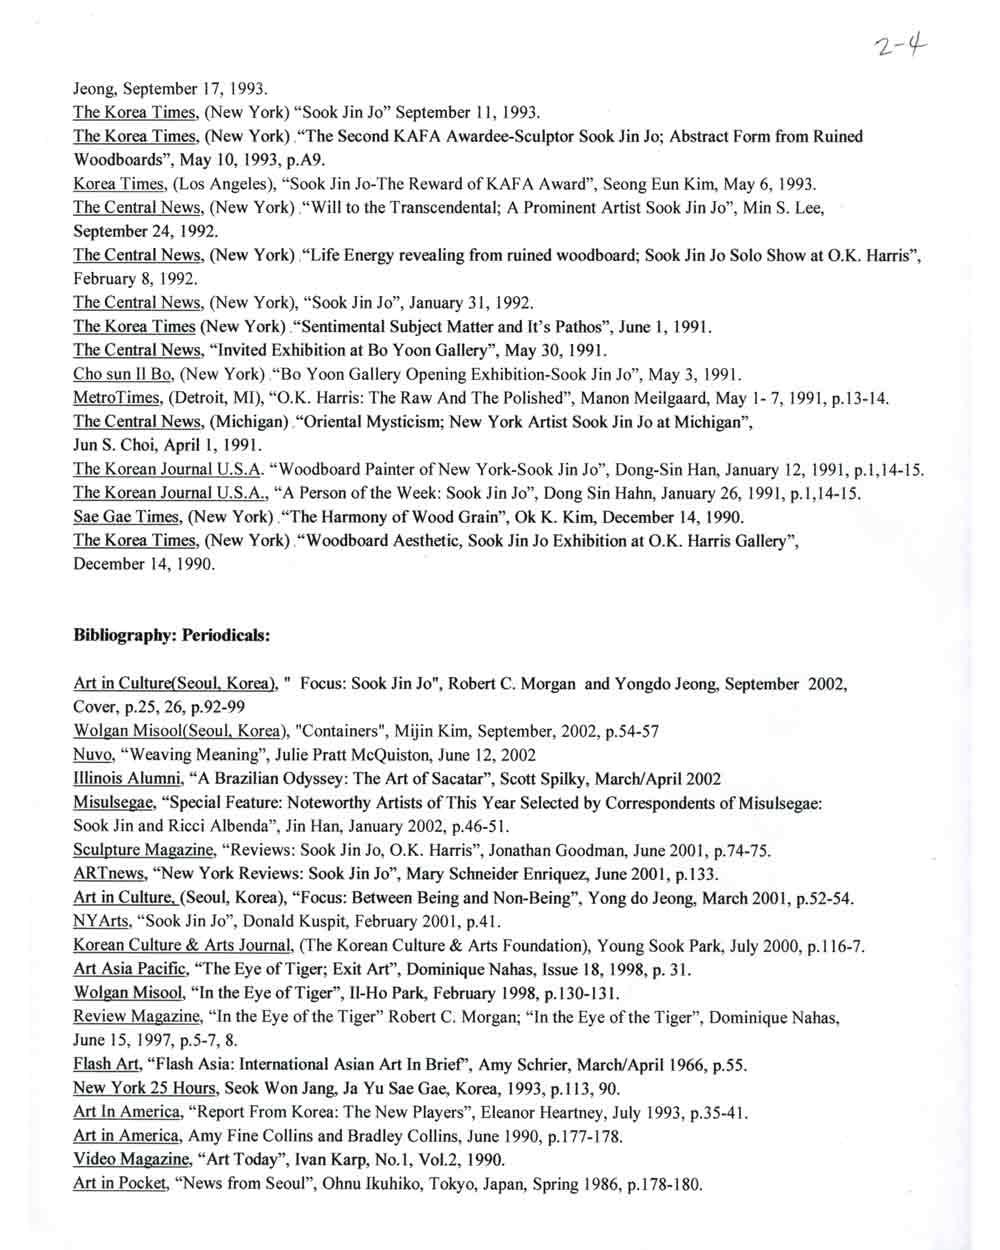 Sook Jin Jo's resume, pg 4